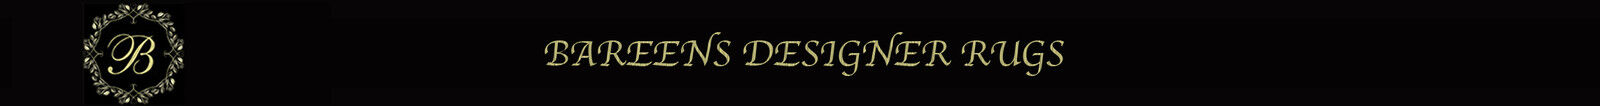 Bareens Designer Rugs